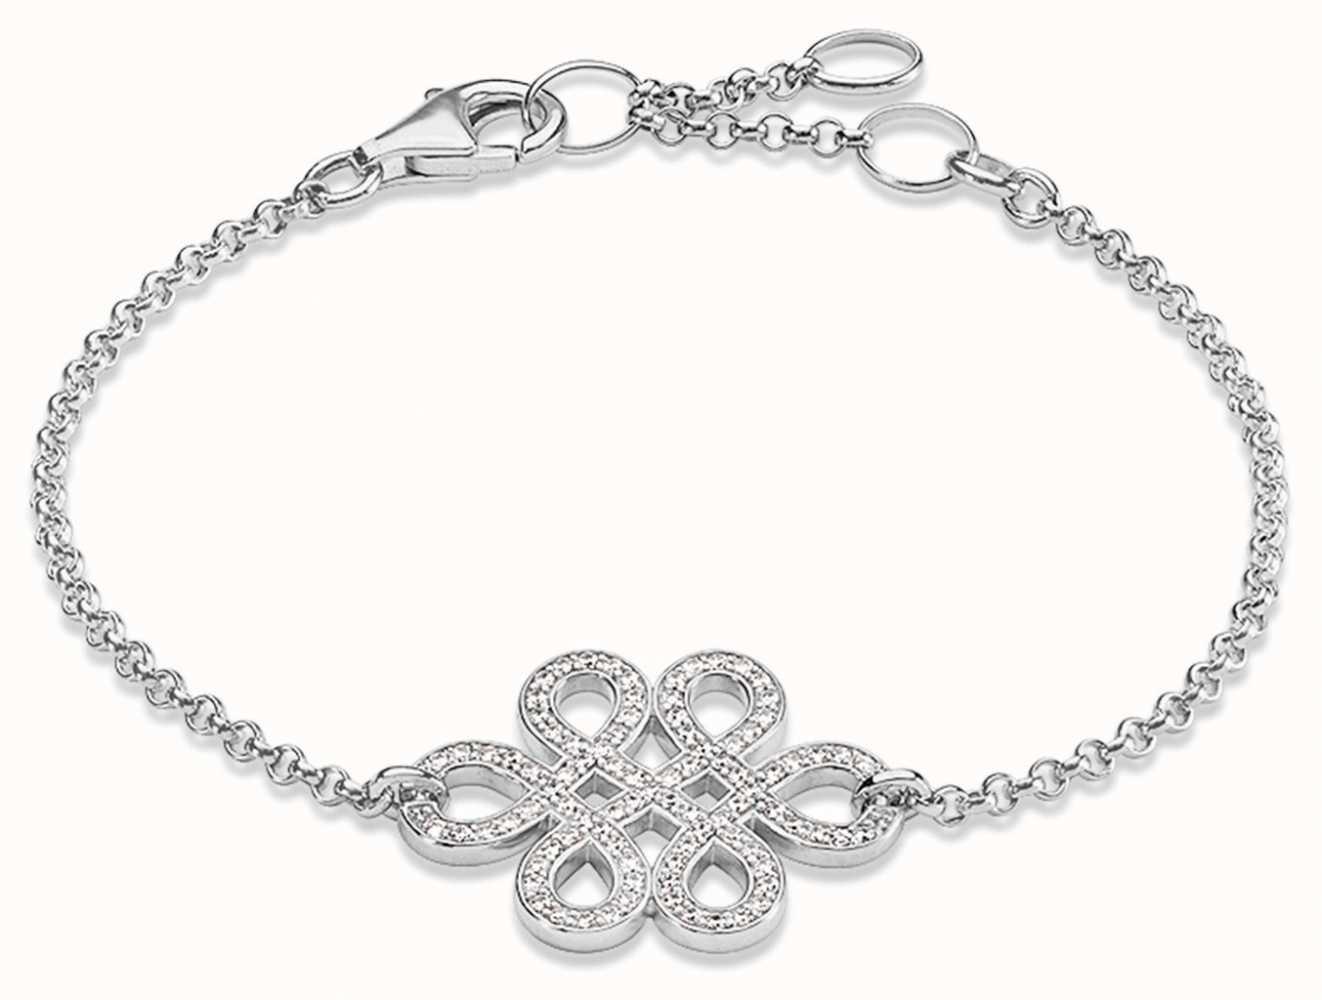 Thomas Sabo Womans Silver Love Knot Bracelet A1226-051-14